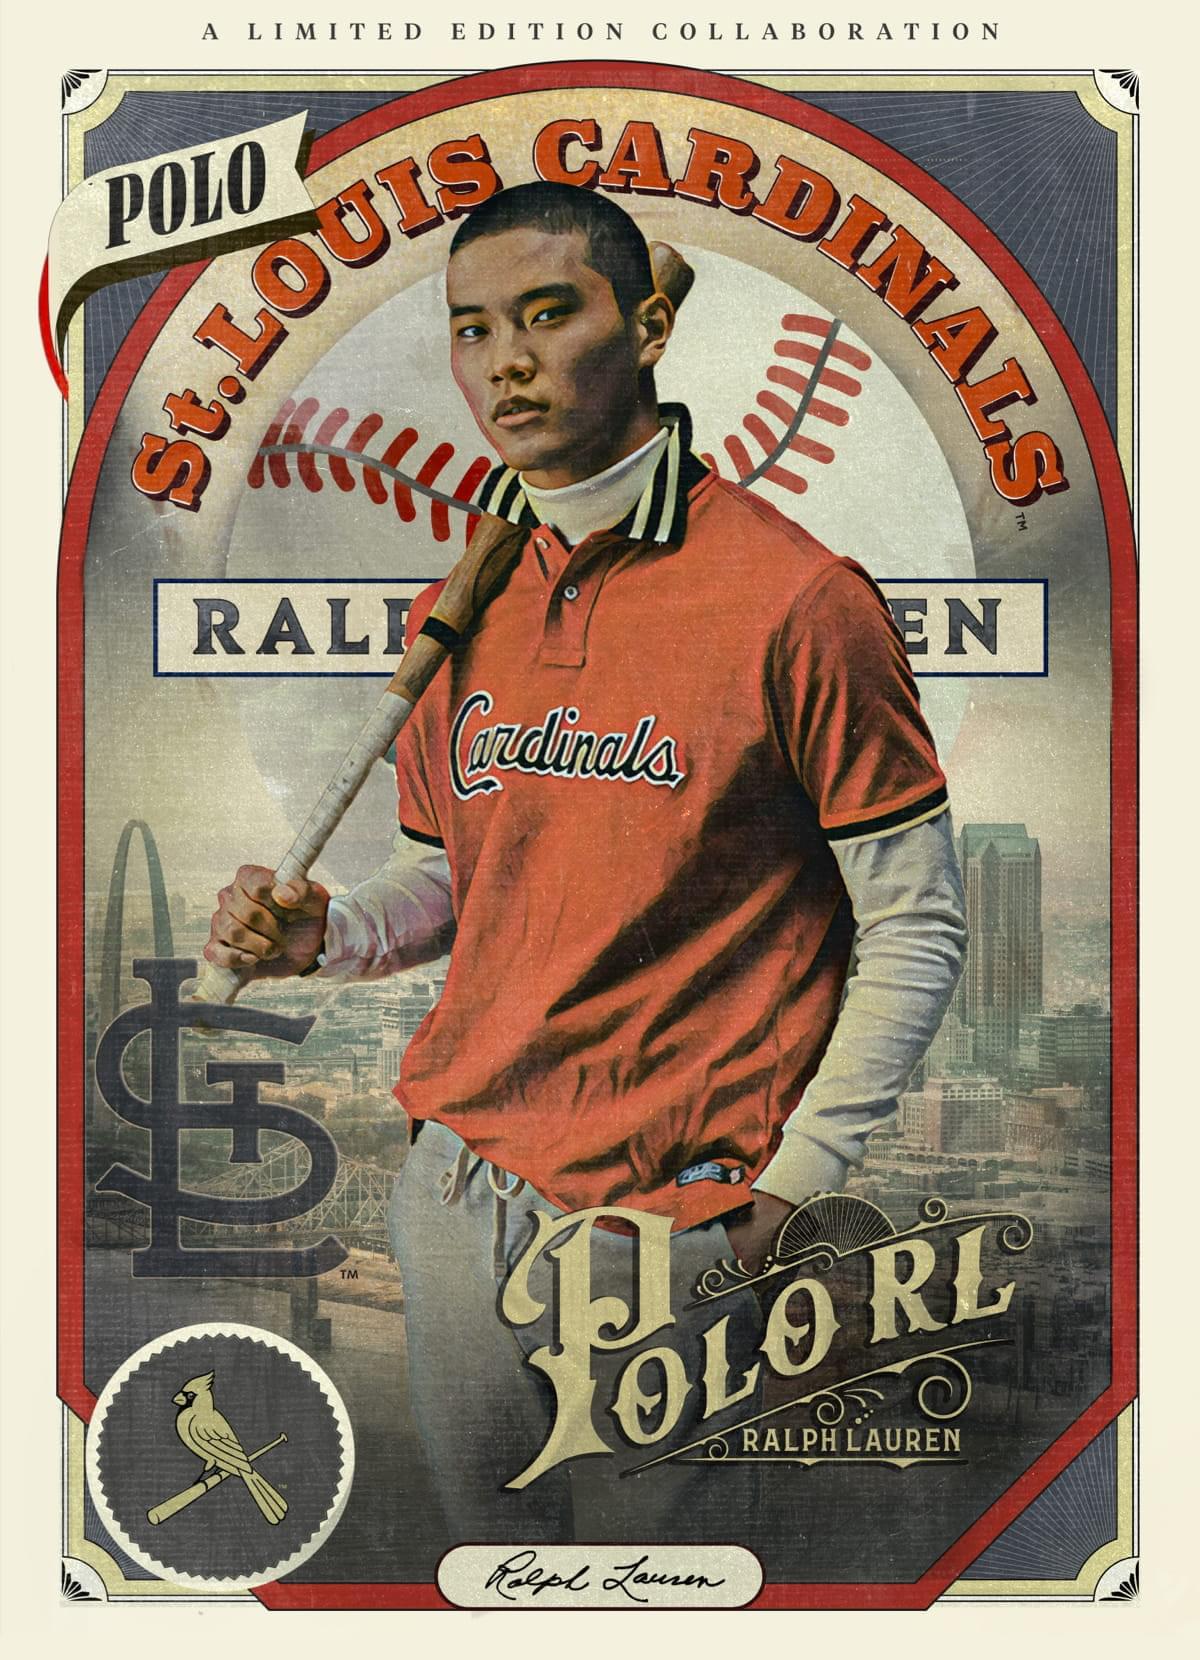 A LIMITED EDITION COLLABORATION Ralph Lauren Cardinalsトレーディングカードのイラスト